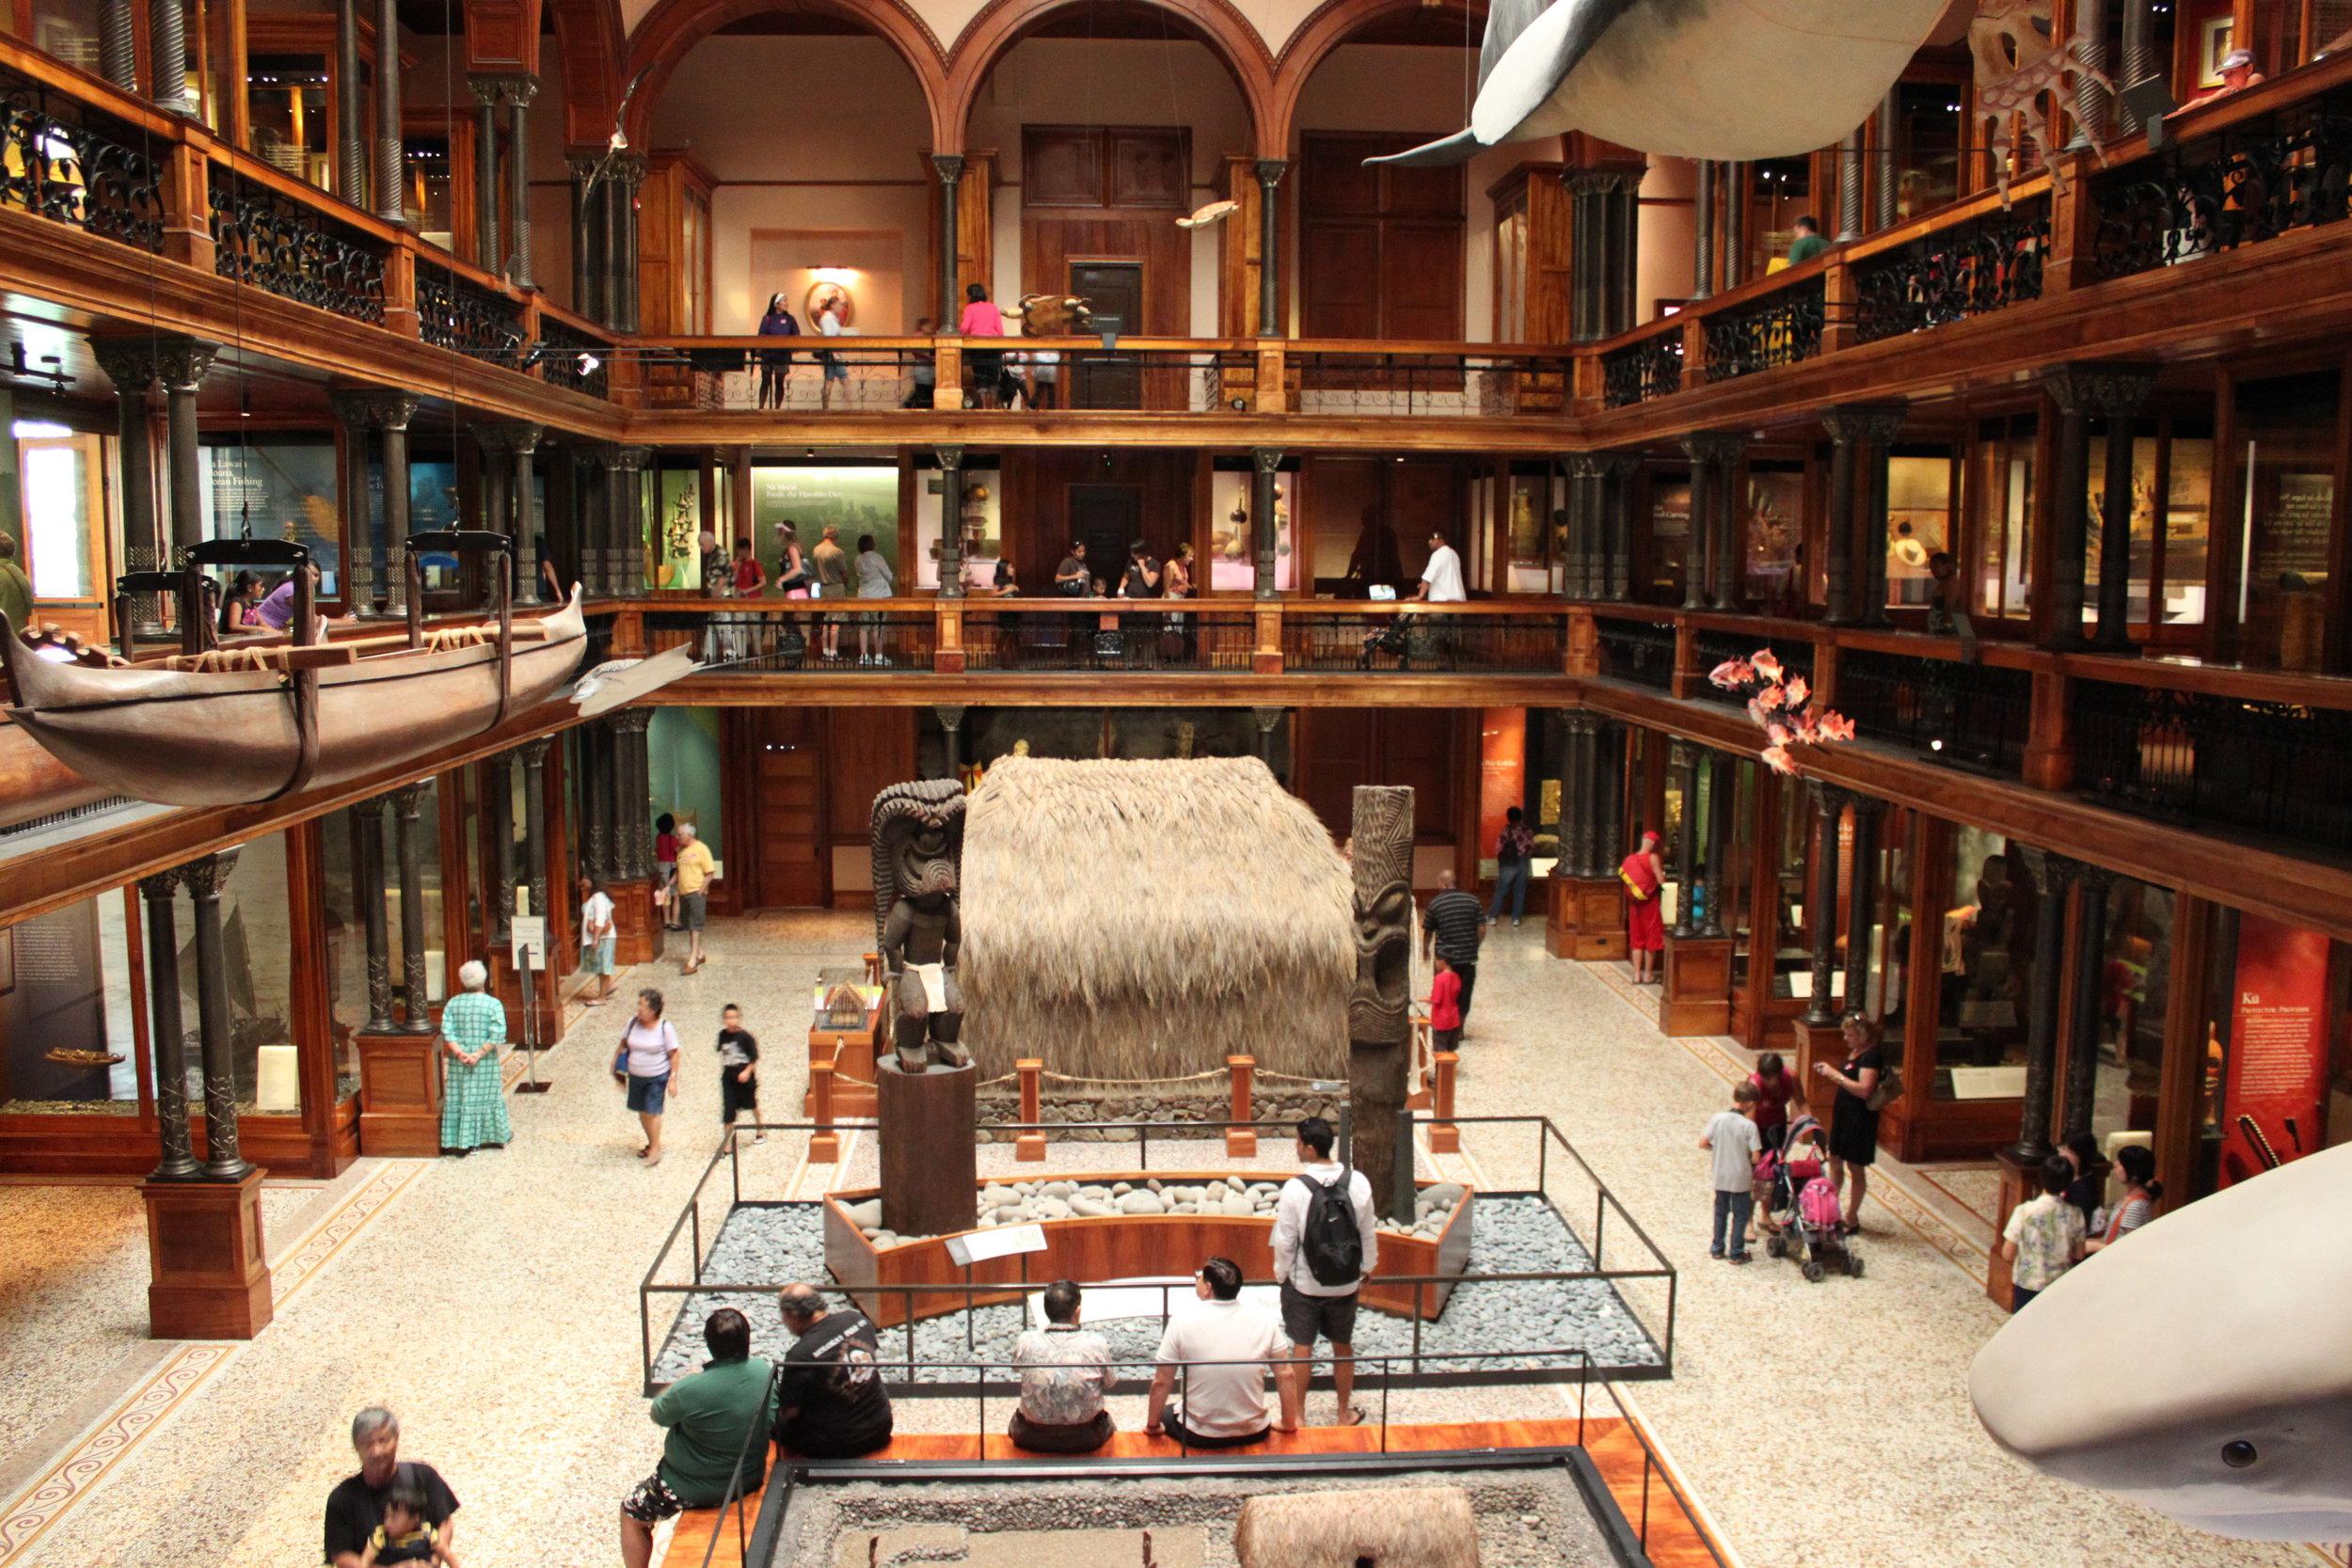 Bishop Museum - Historical